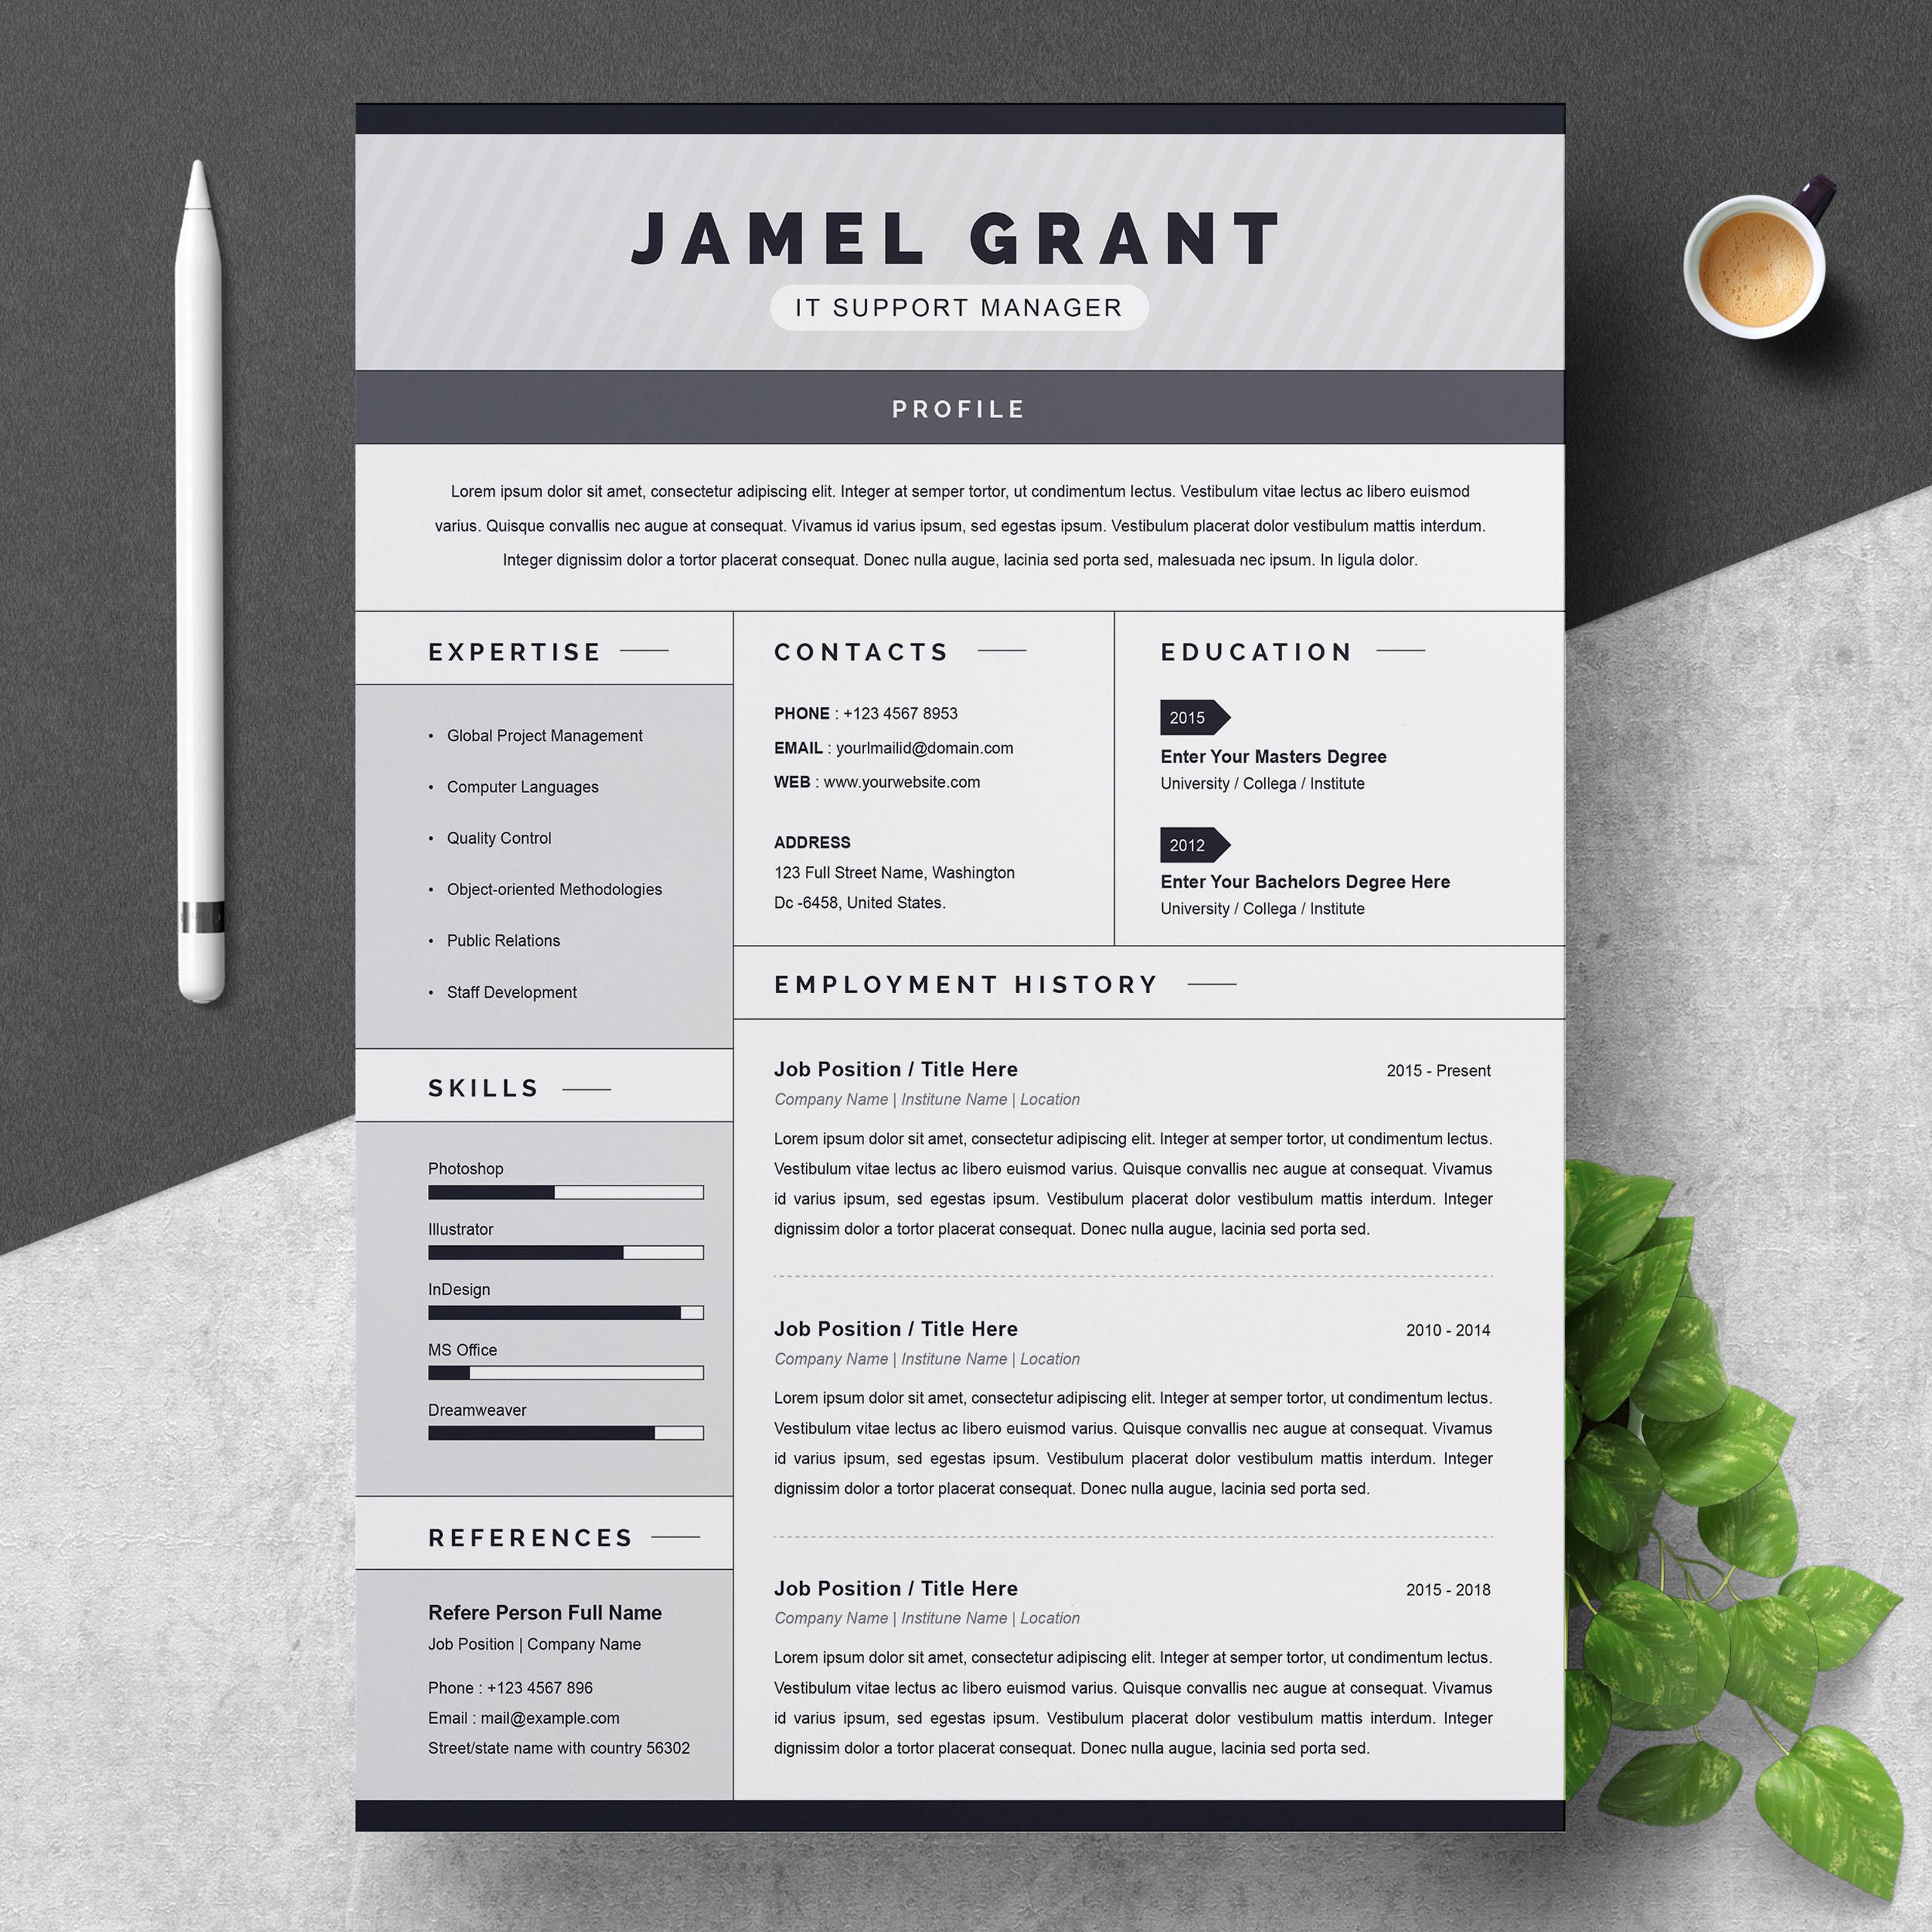 Jamel Resume Template 79227